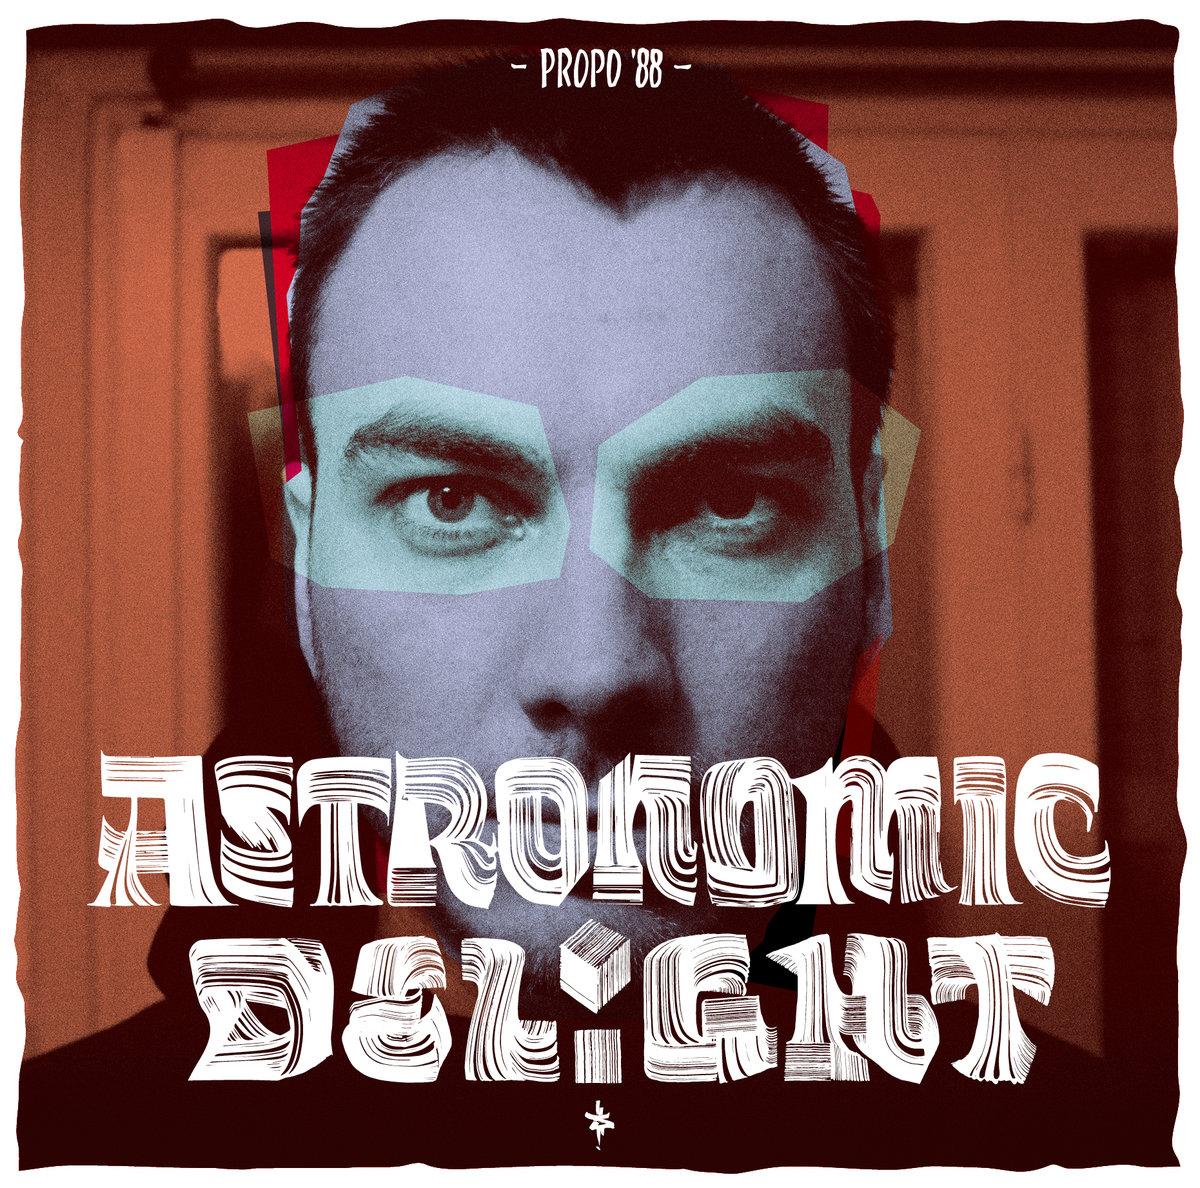 Astronomic_delight